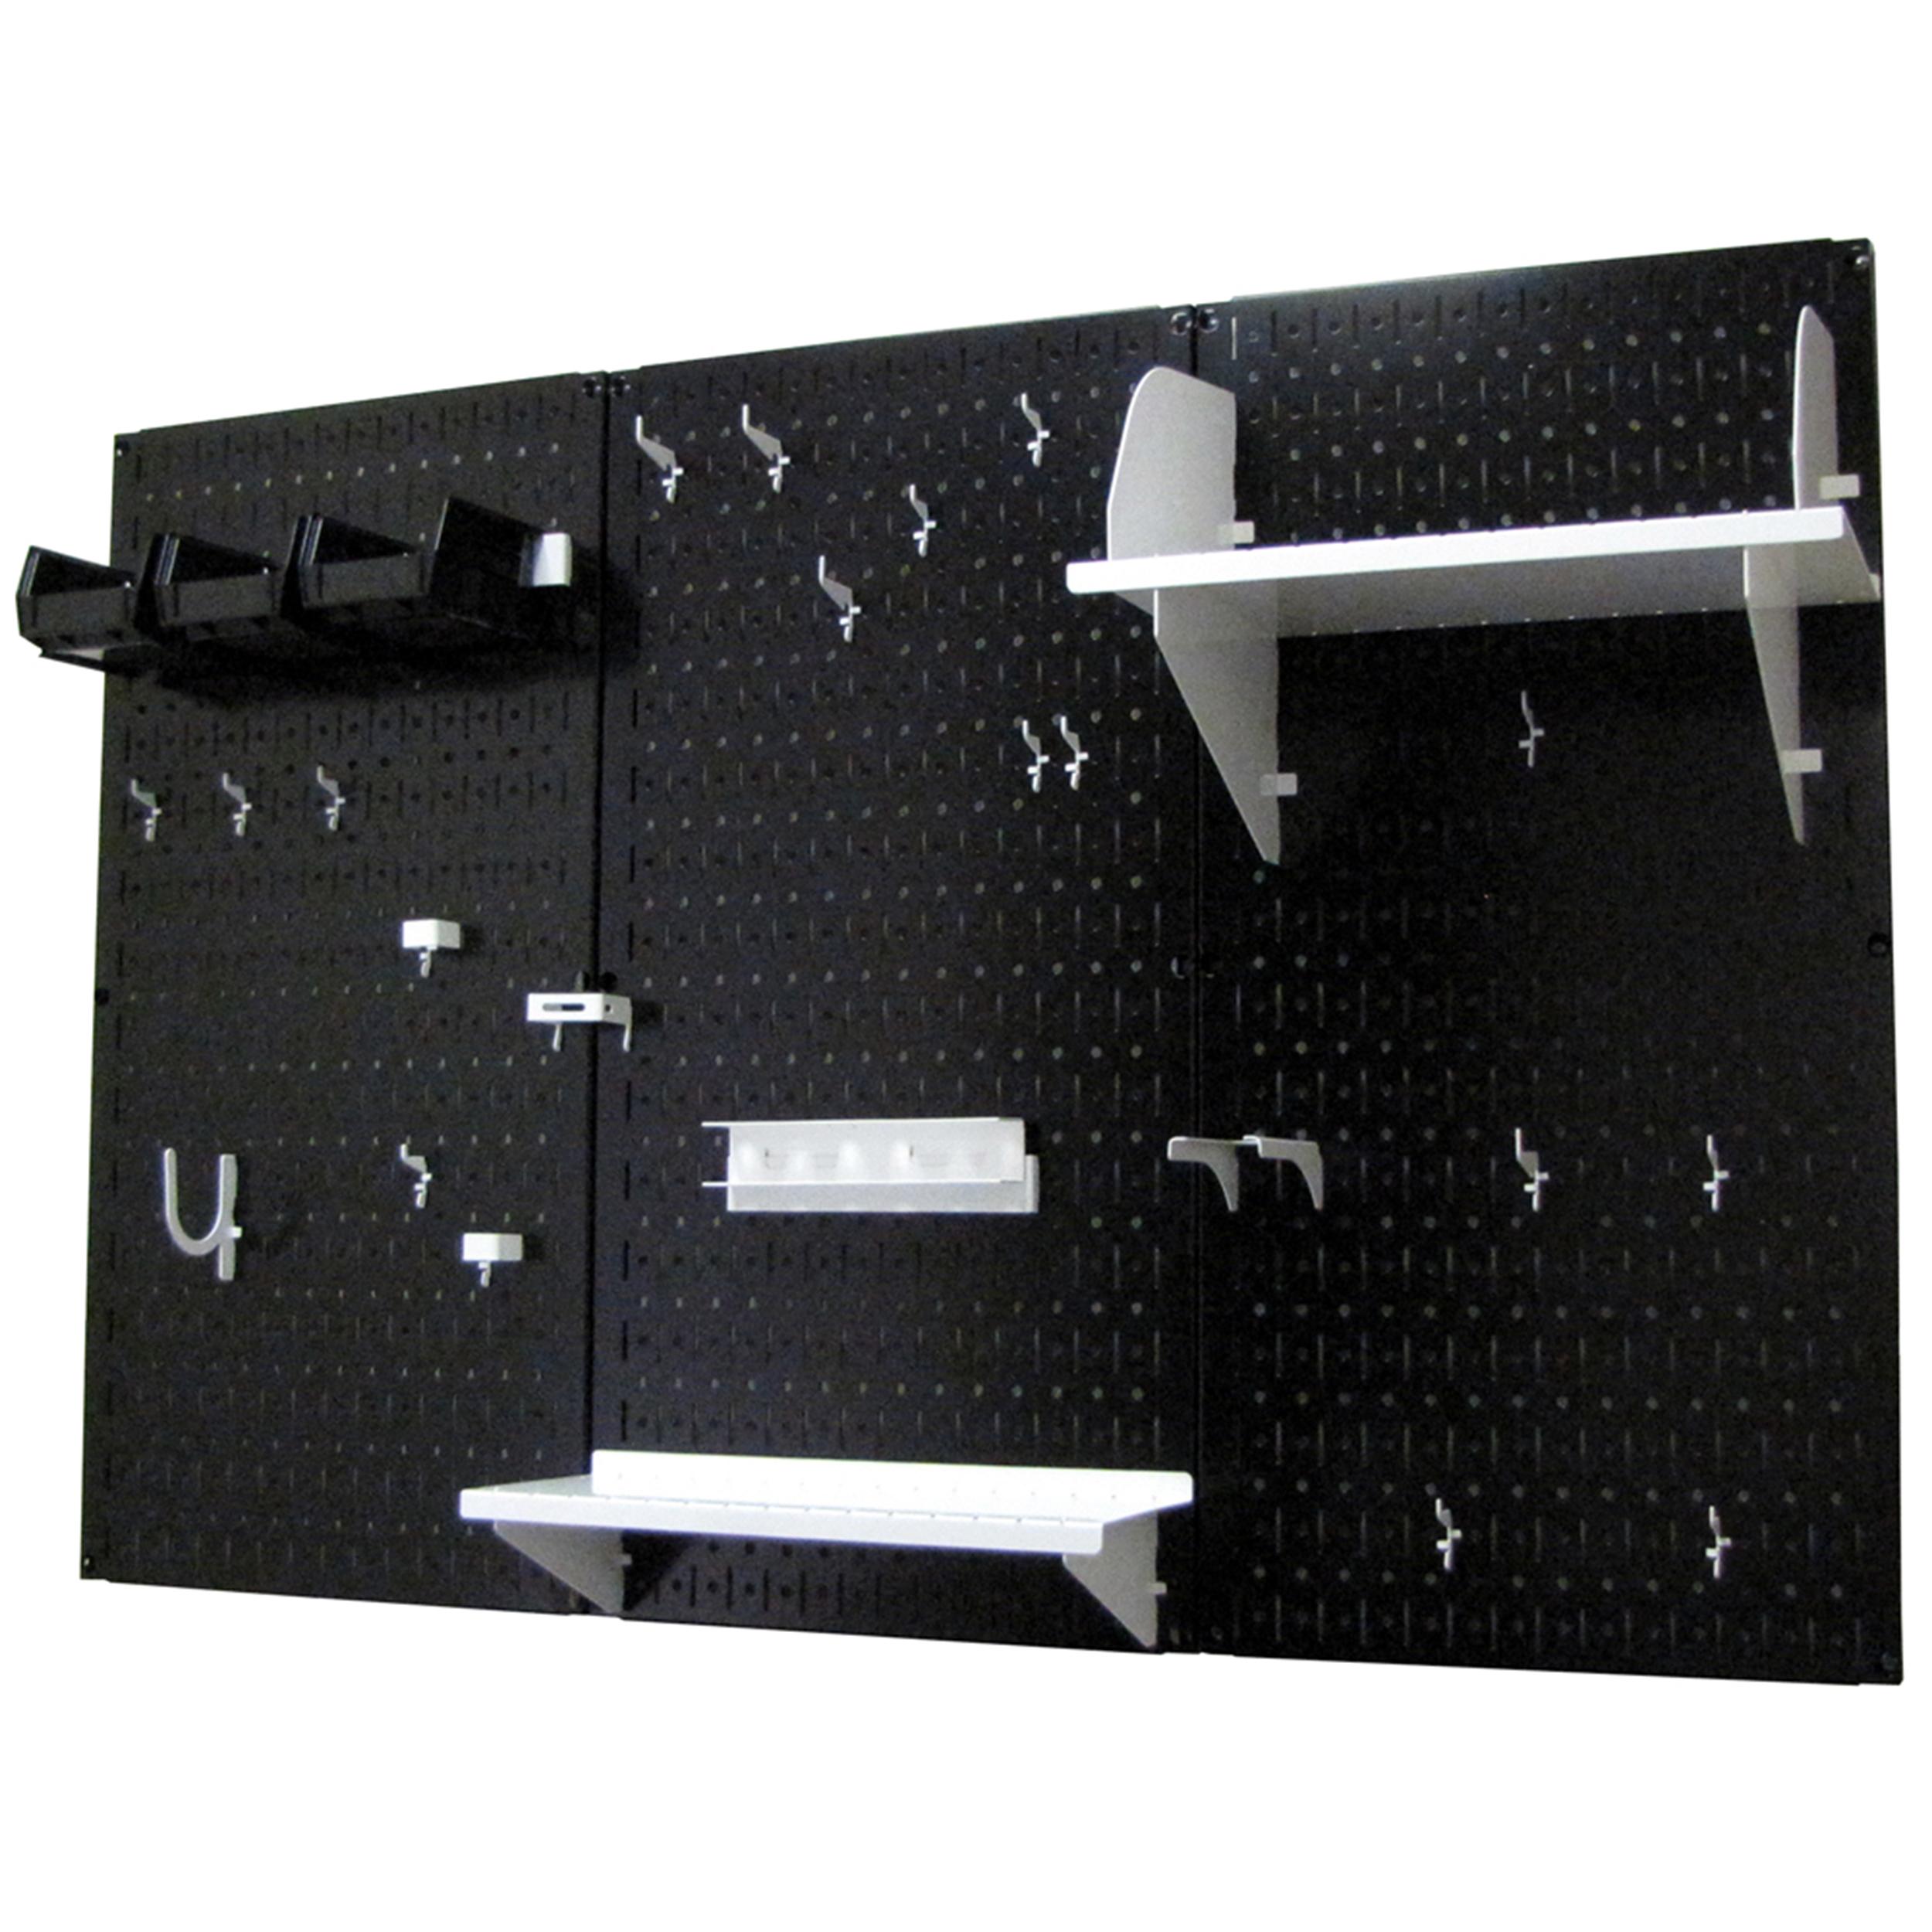 4' Metal Pegboard Standard Tool Storage Kit - Black Toolboard & White Accessories